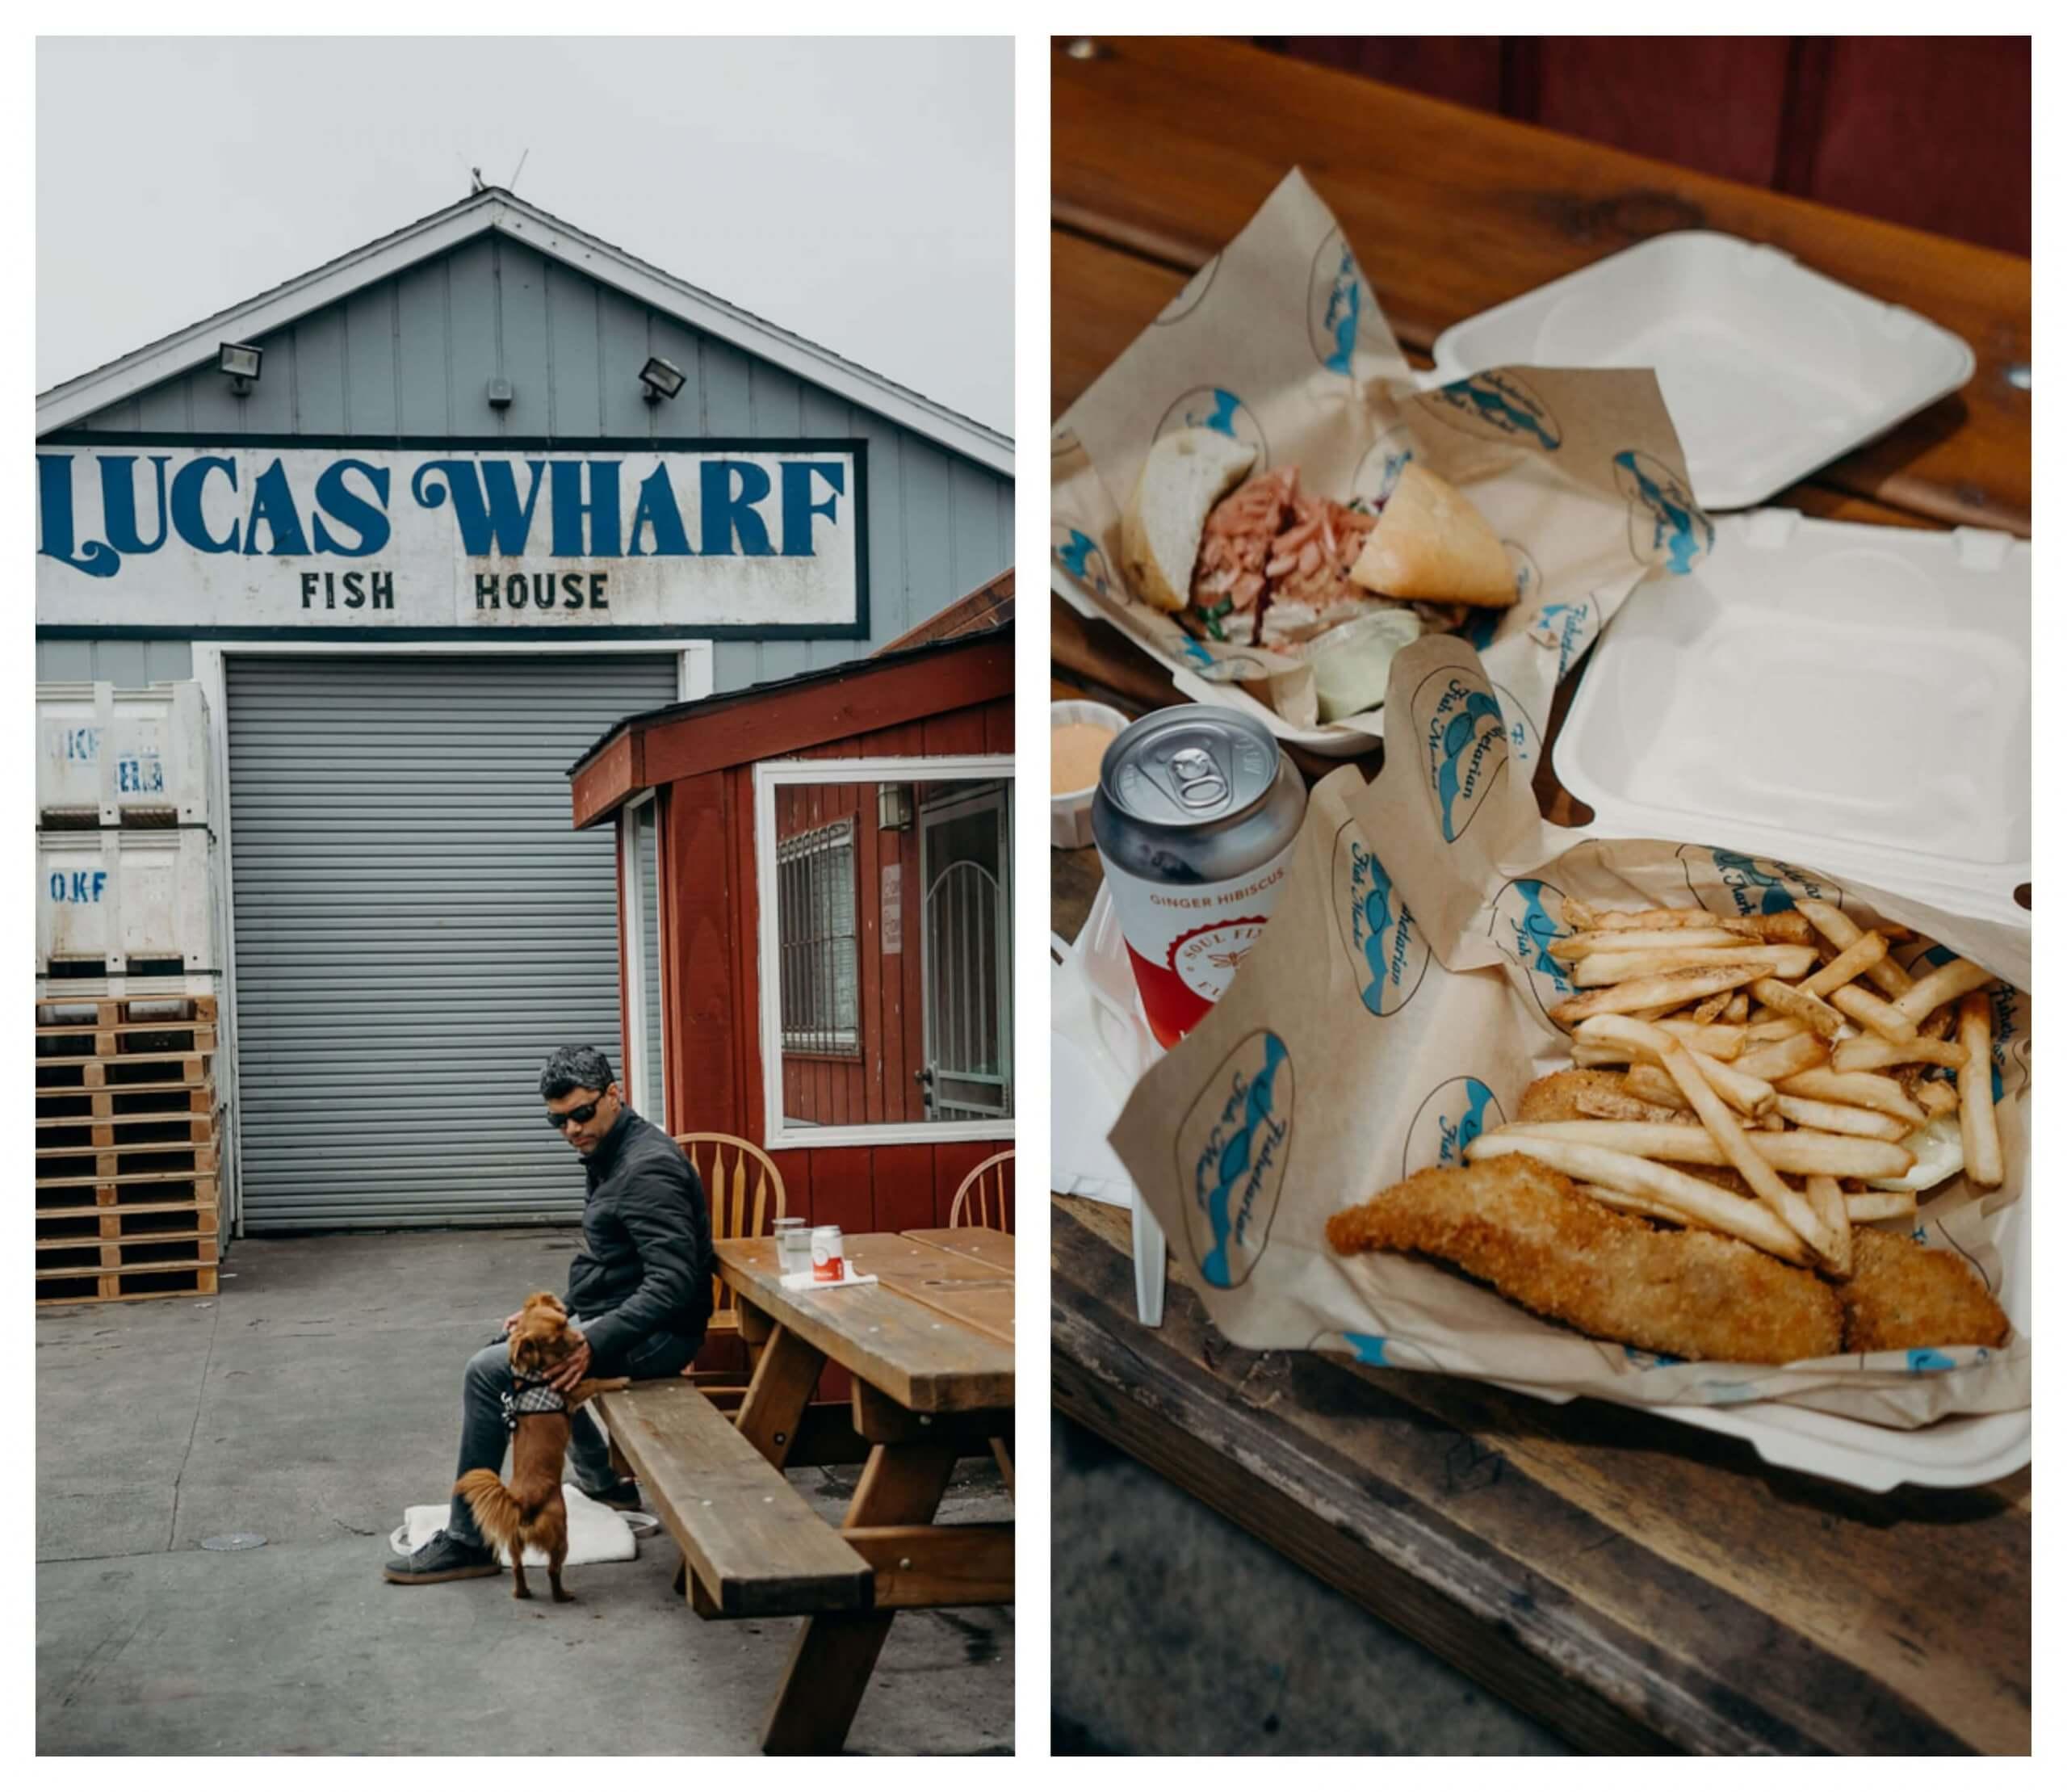 Restaurants in Bodega Bay, Fishetarian Fish Market